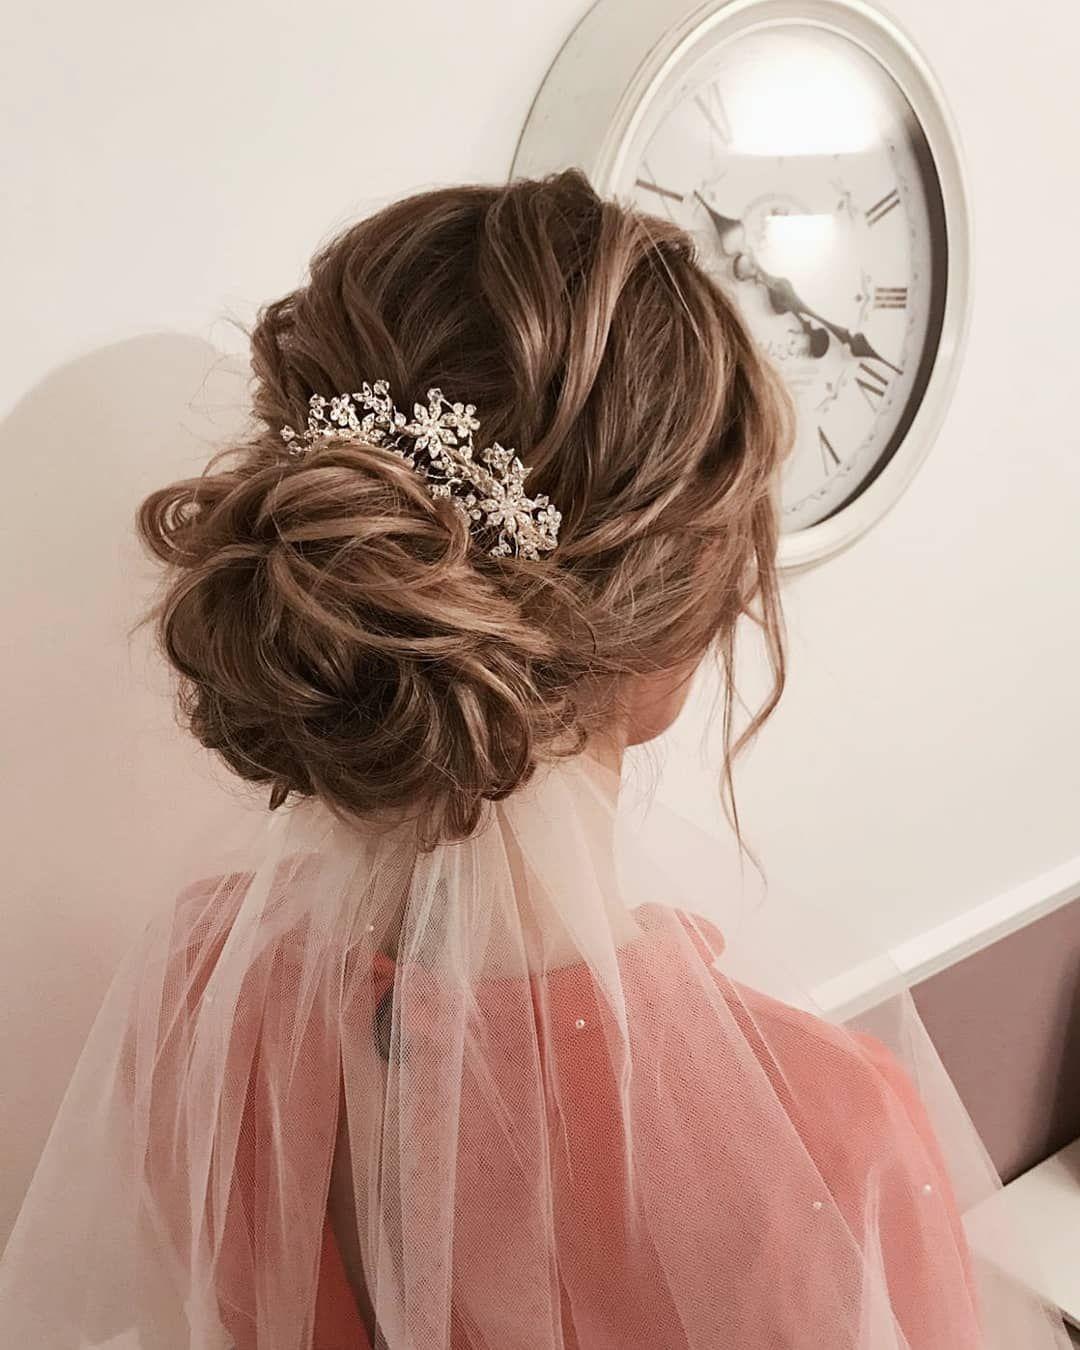 Wedding Hairstyle Hashtags: #bridalhair Hashtag On Instagram • Photos And Videos